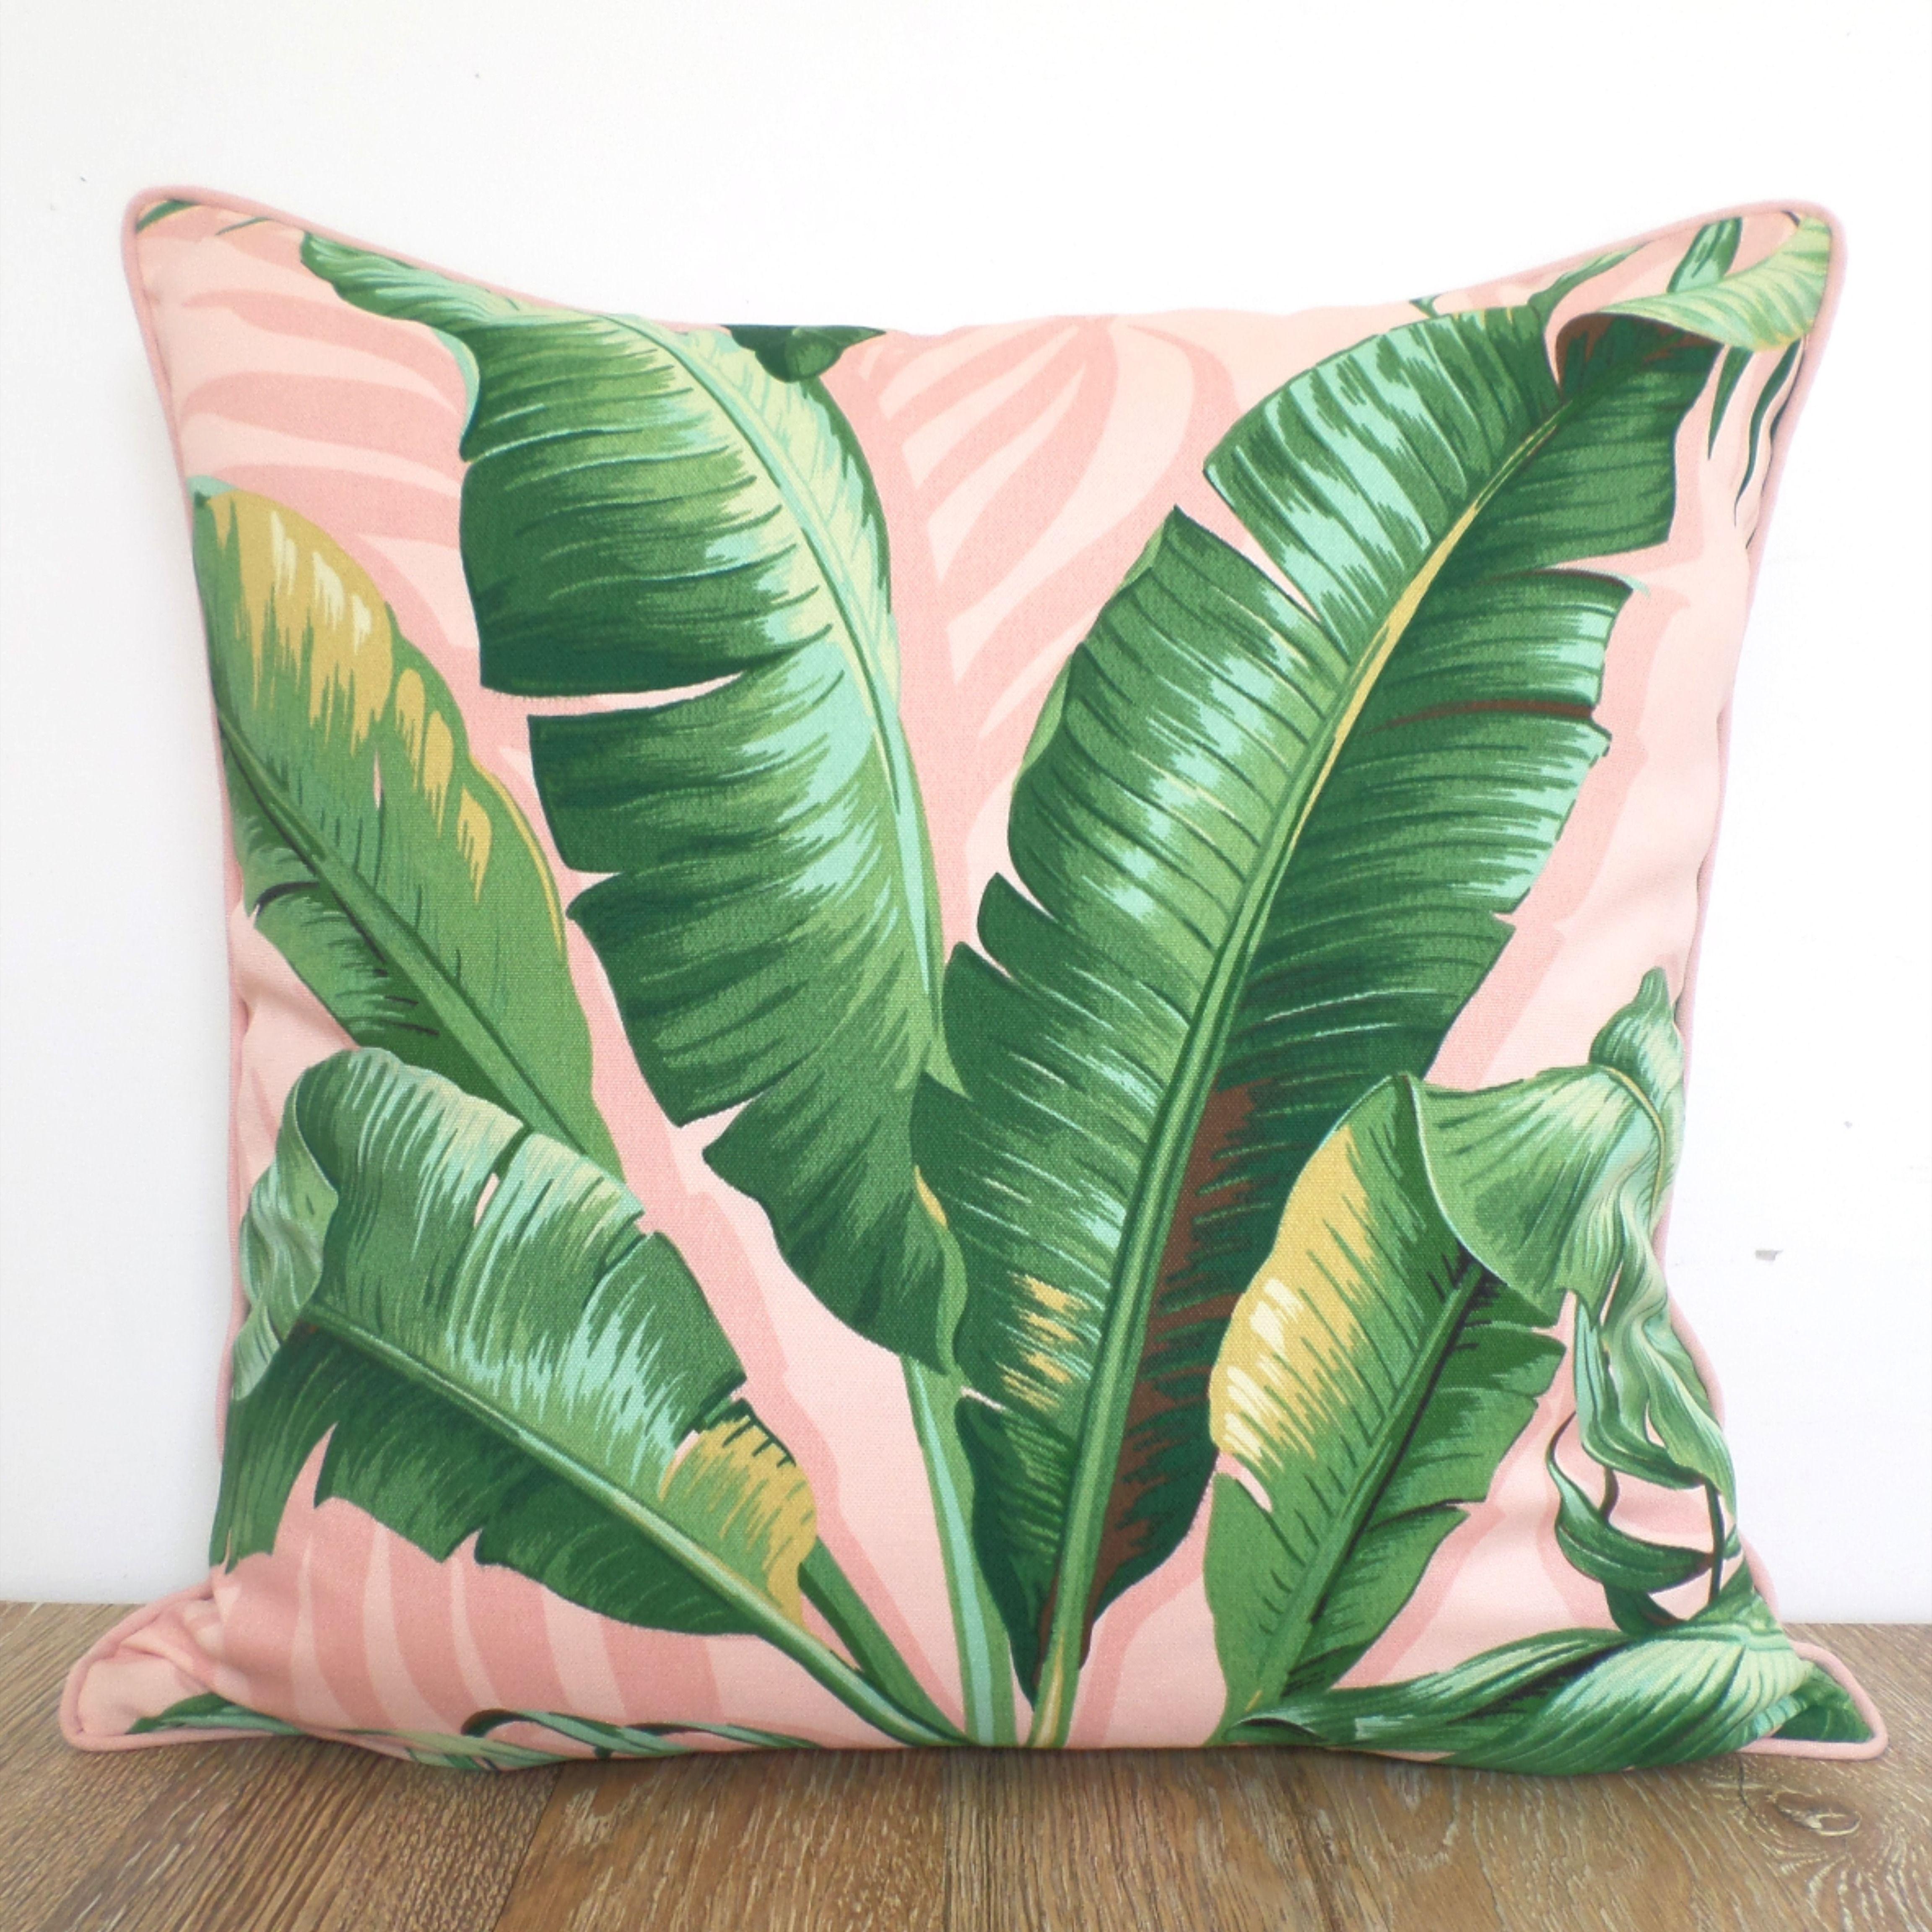 banana leaf pillow cover 20x20 old florida decor blush etsy in 2020 tropical pillows tropical throw pillow banana leaf pillow